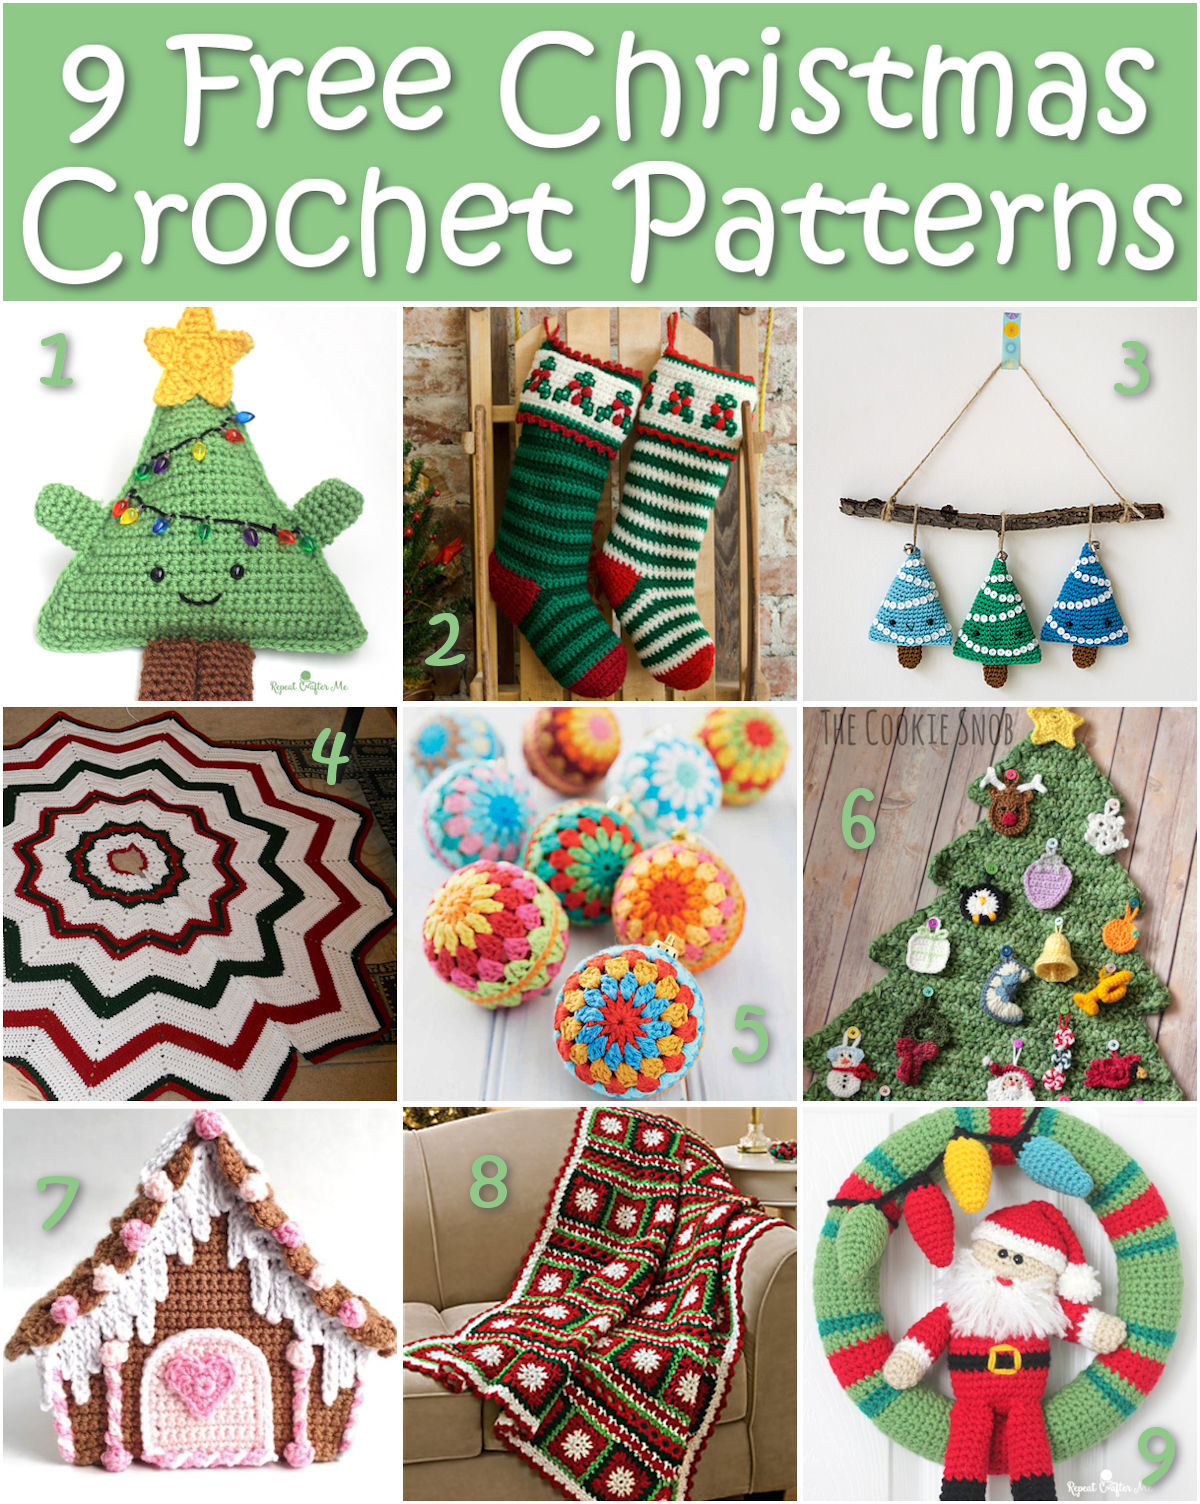 9 Free Christmas Crochet Patterns |